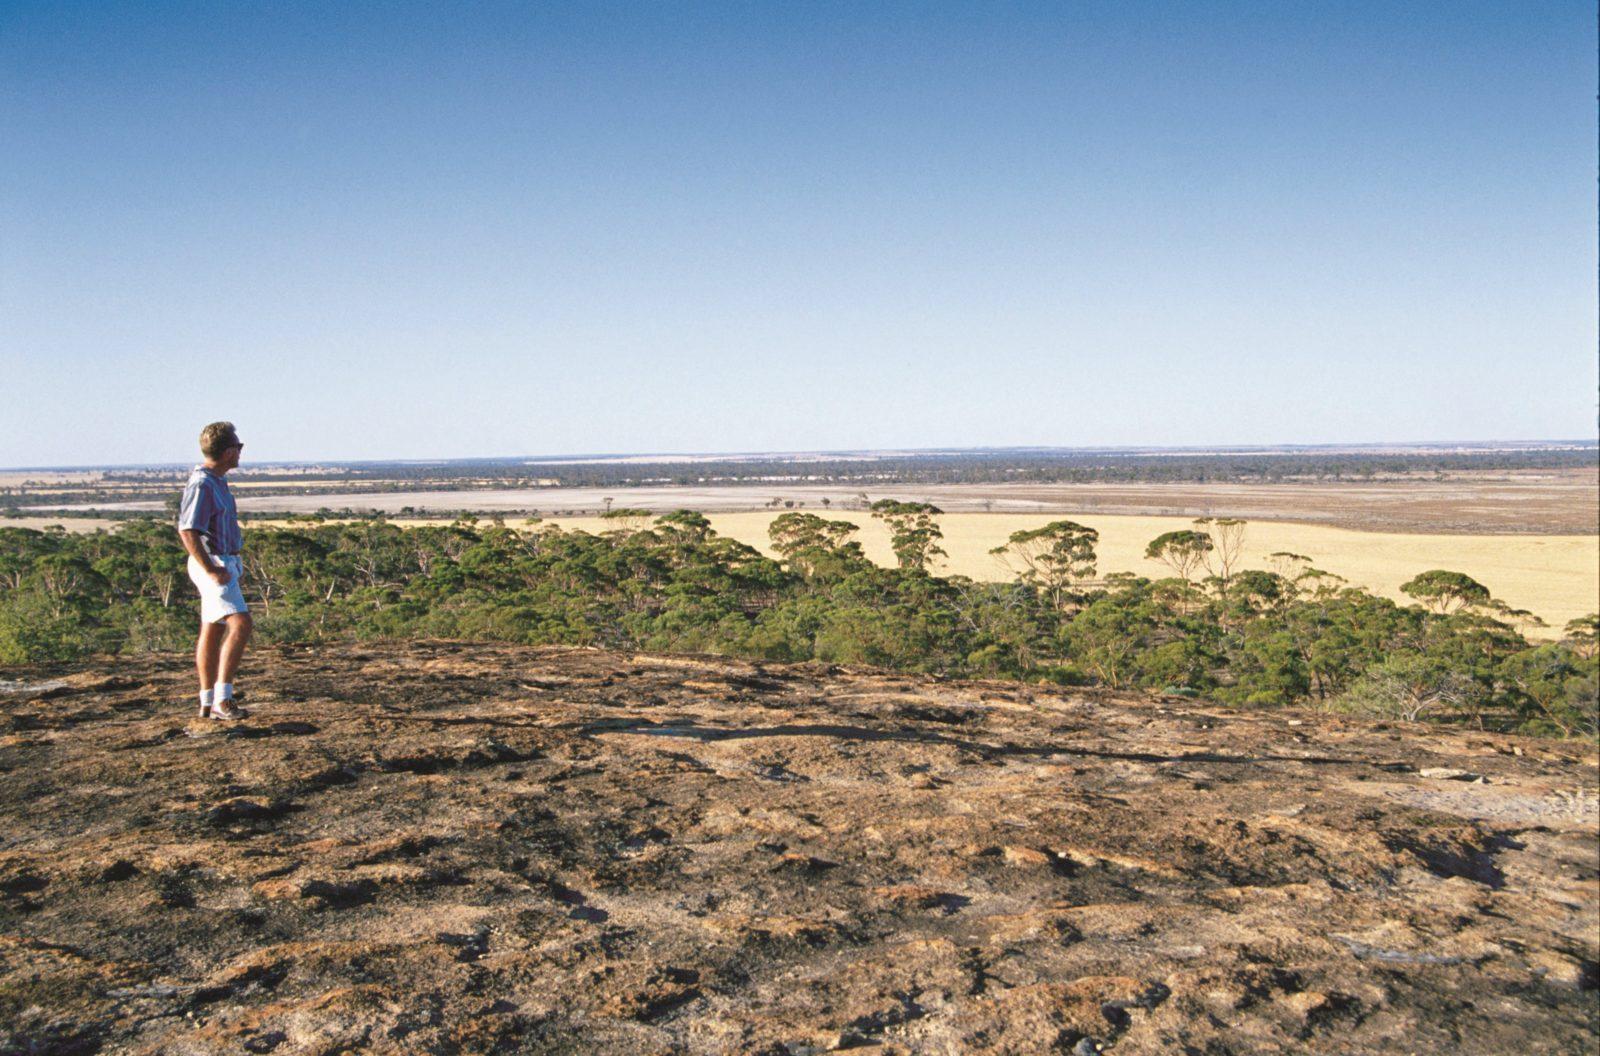 Marshall Rock, Bencubbin, Western Australia